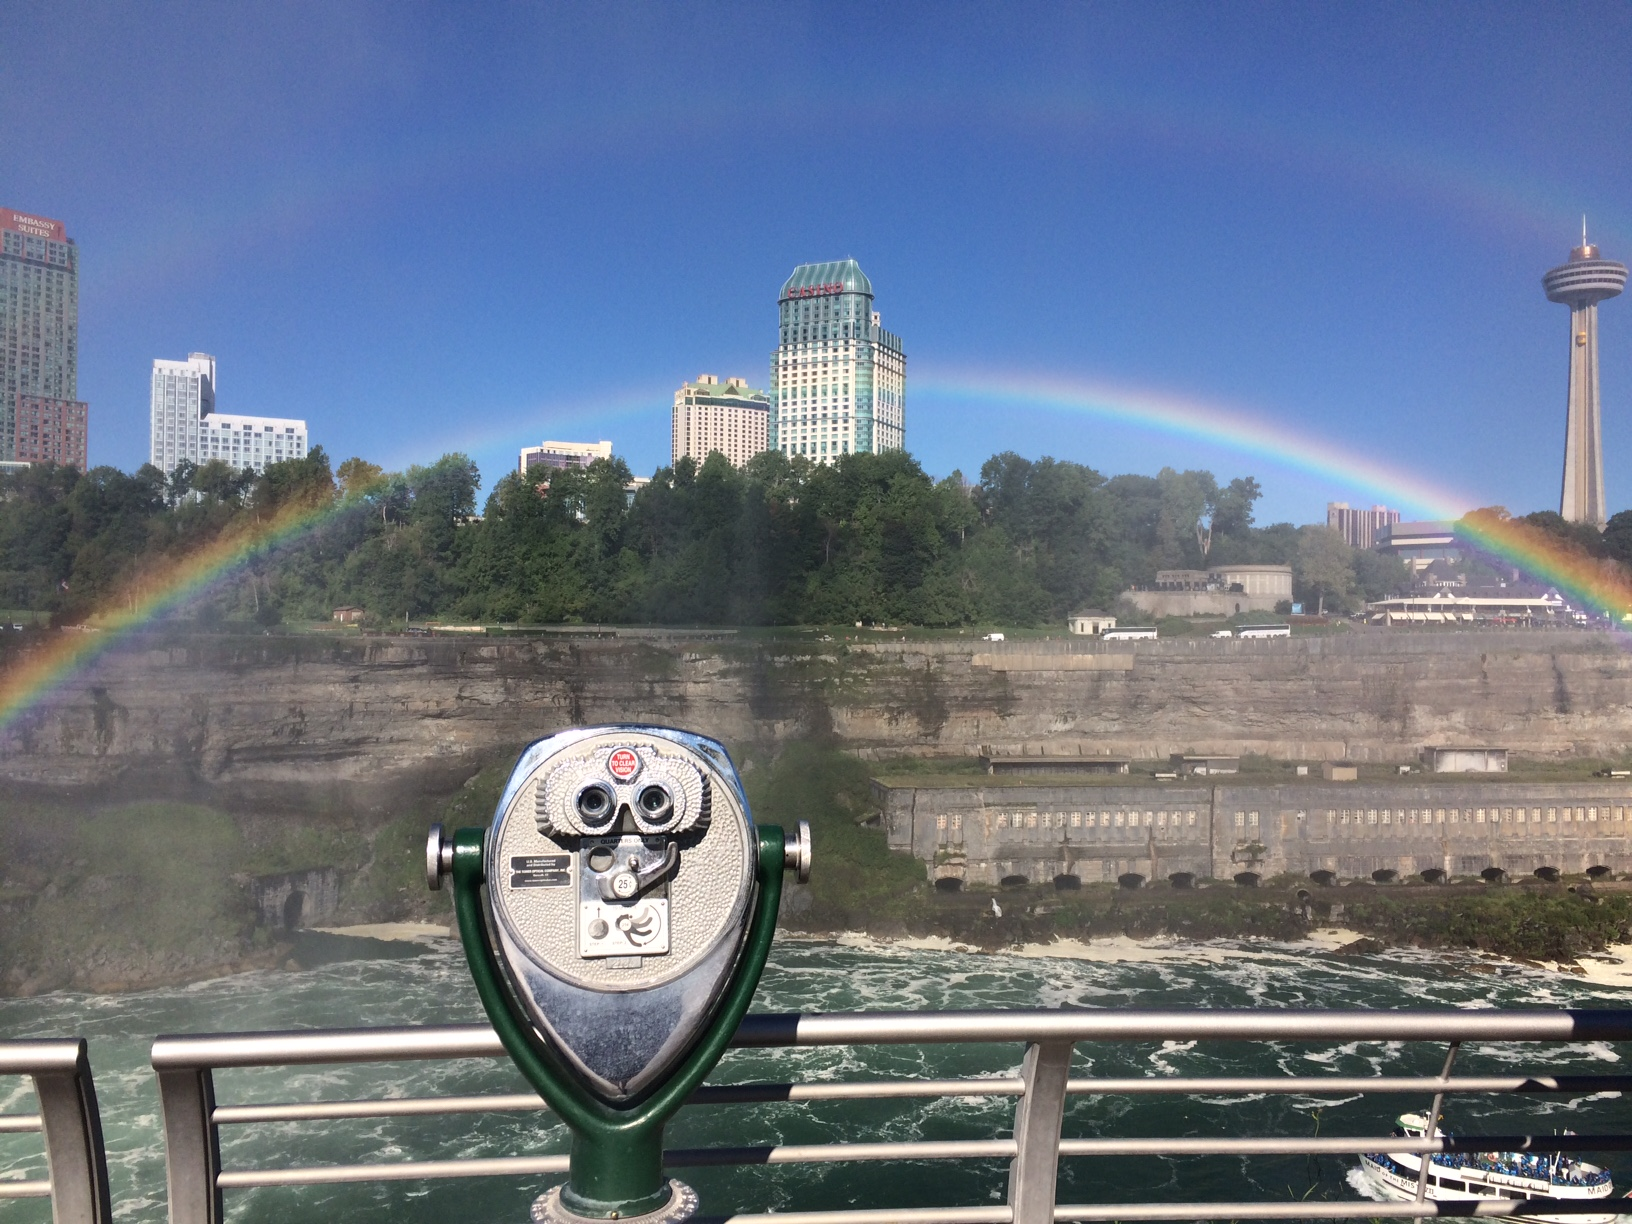 Niagara Falls Viewer